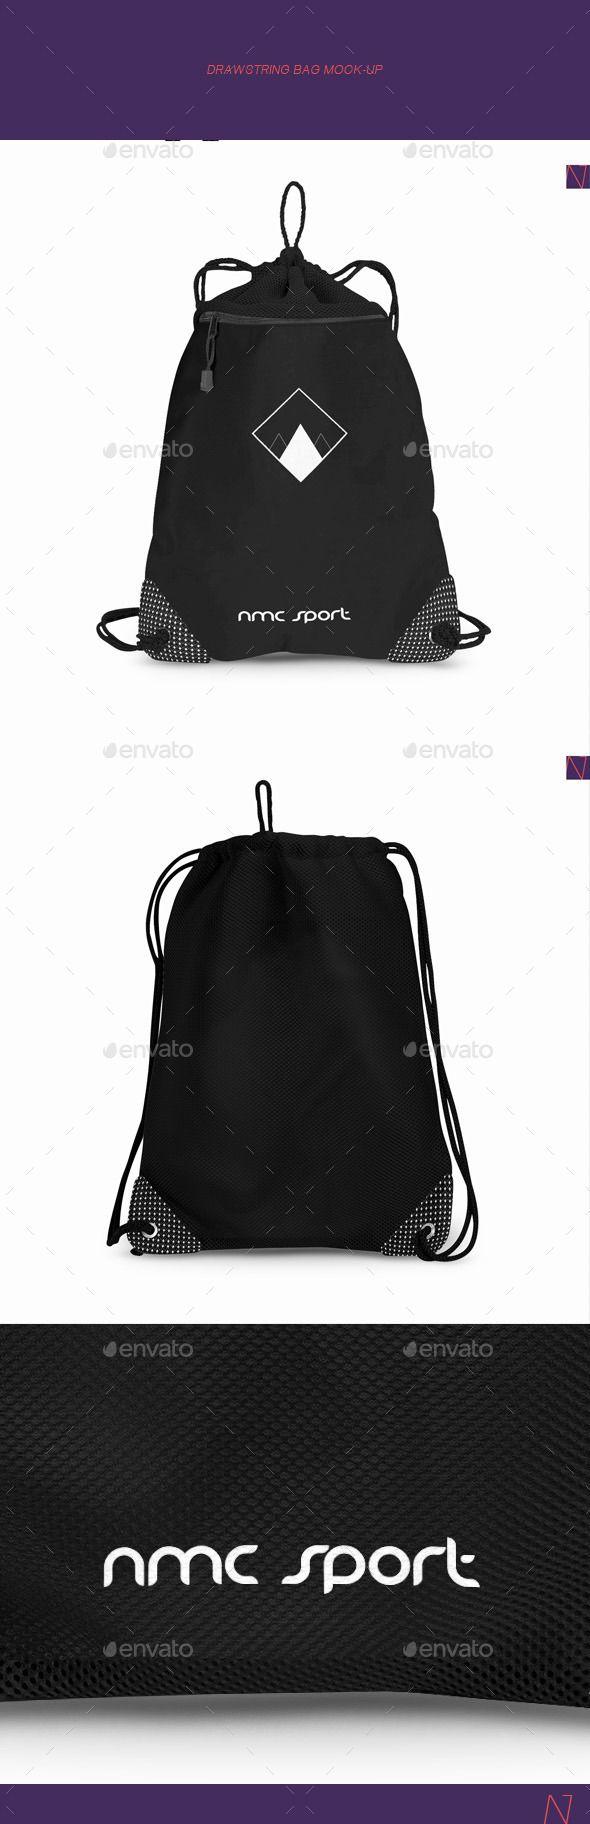 Download Drawstring Bag Mock Up Bagmockup Download Http Graphicriver Net Item Drawstring Bag Mockup 9265639 Ref Ksioks Bag Mockup Bags Drawstring Bag